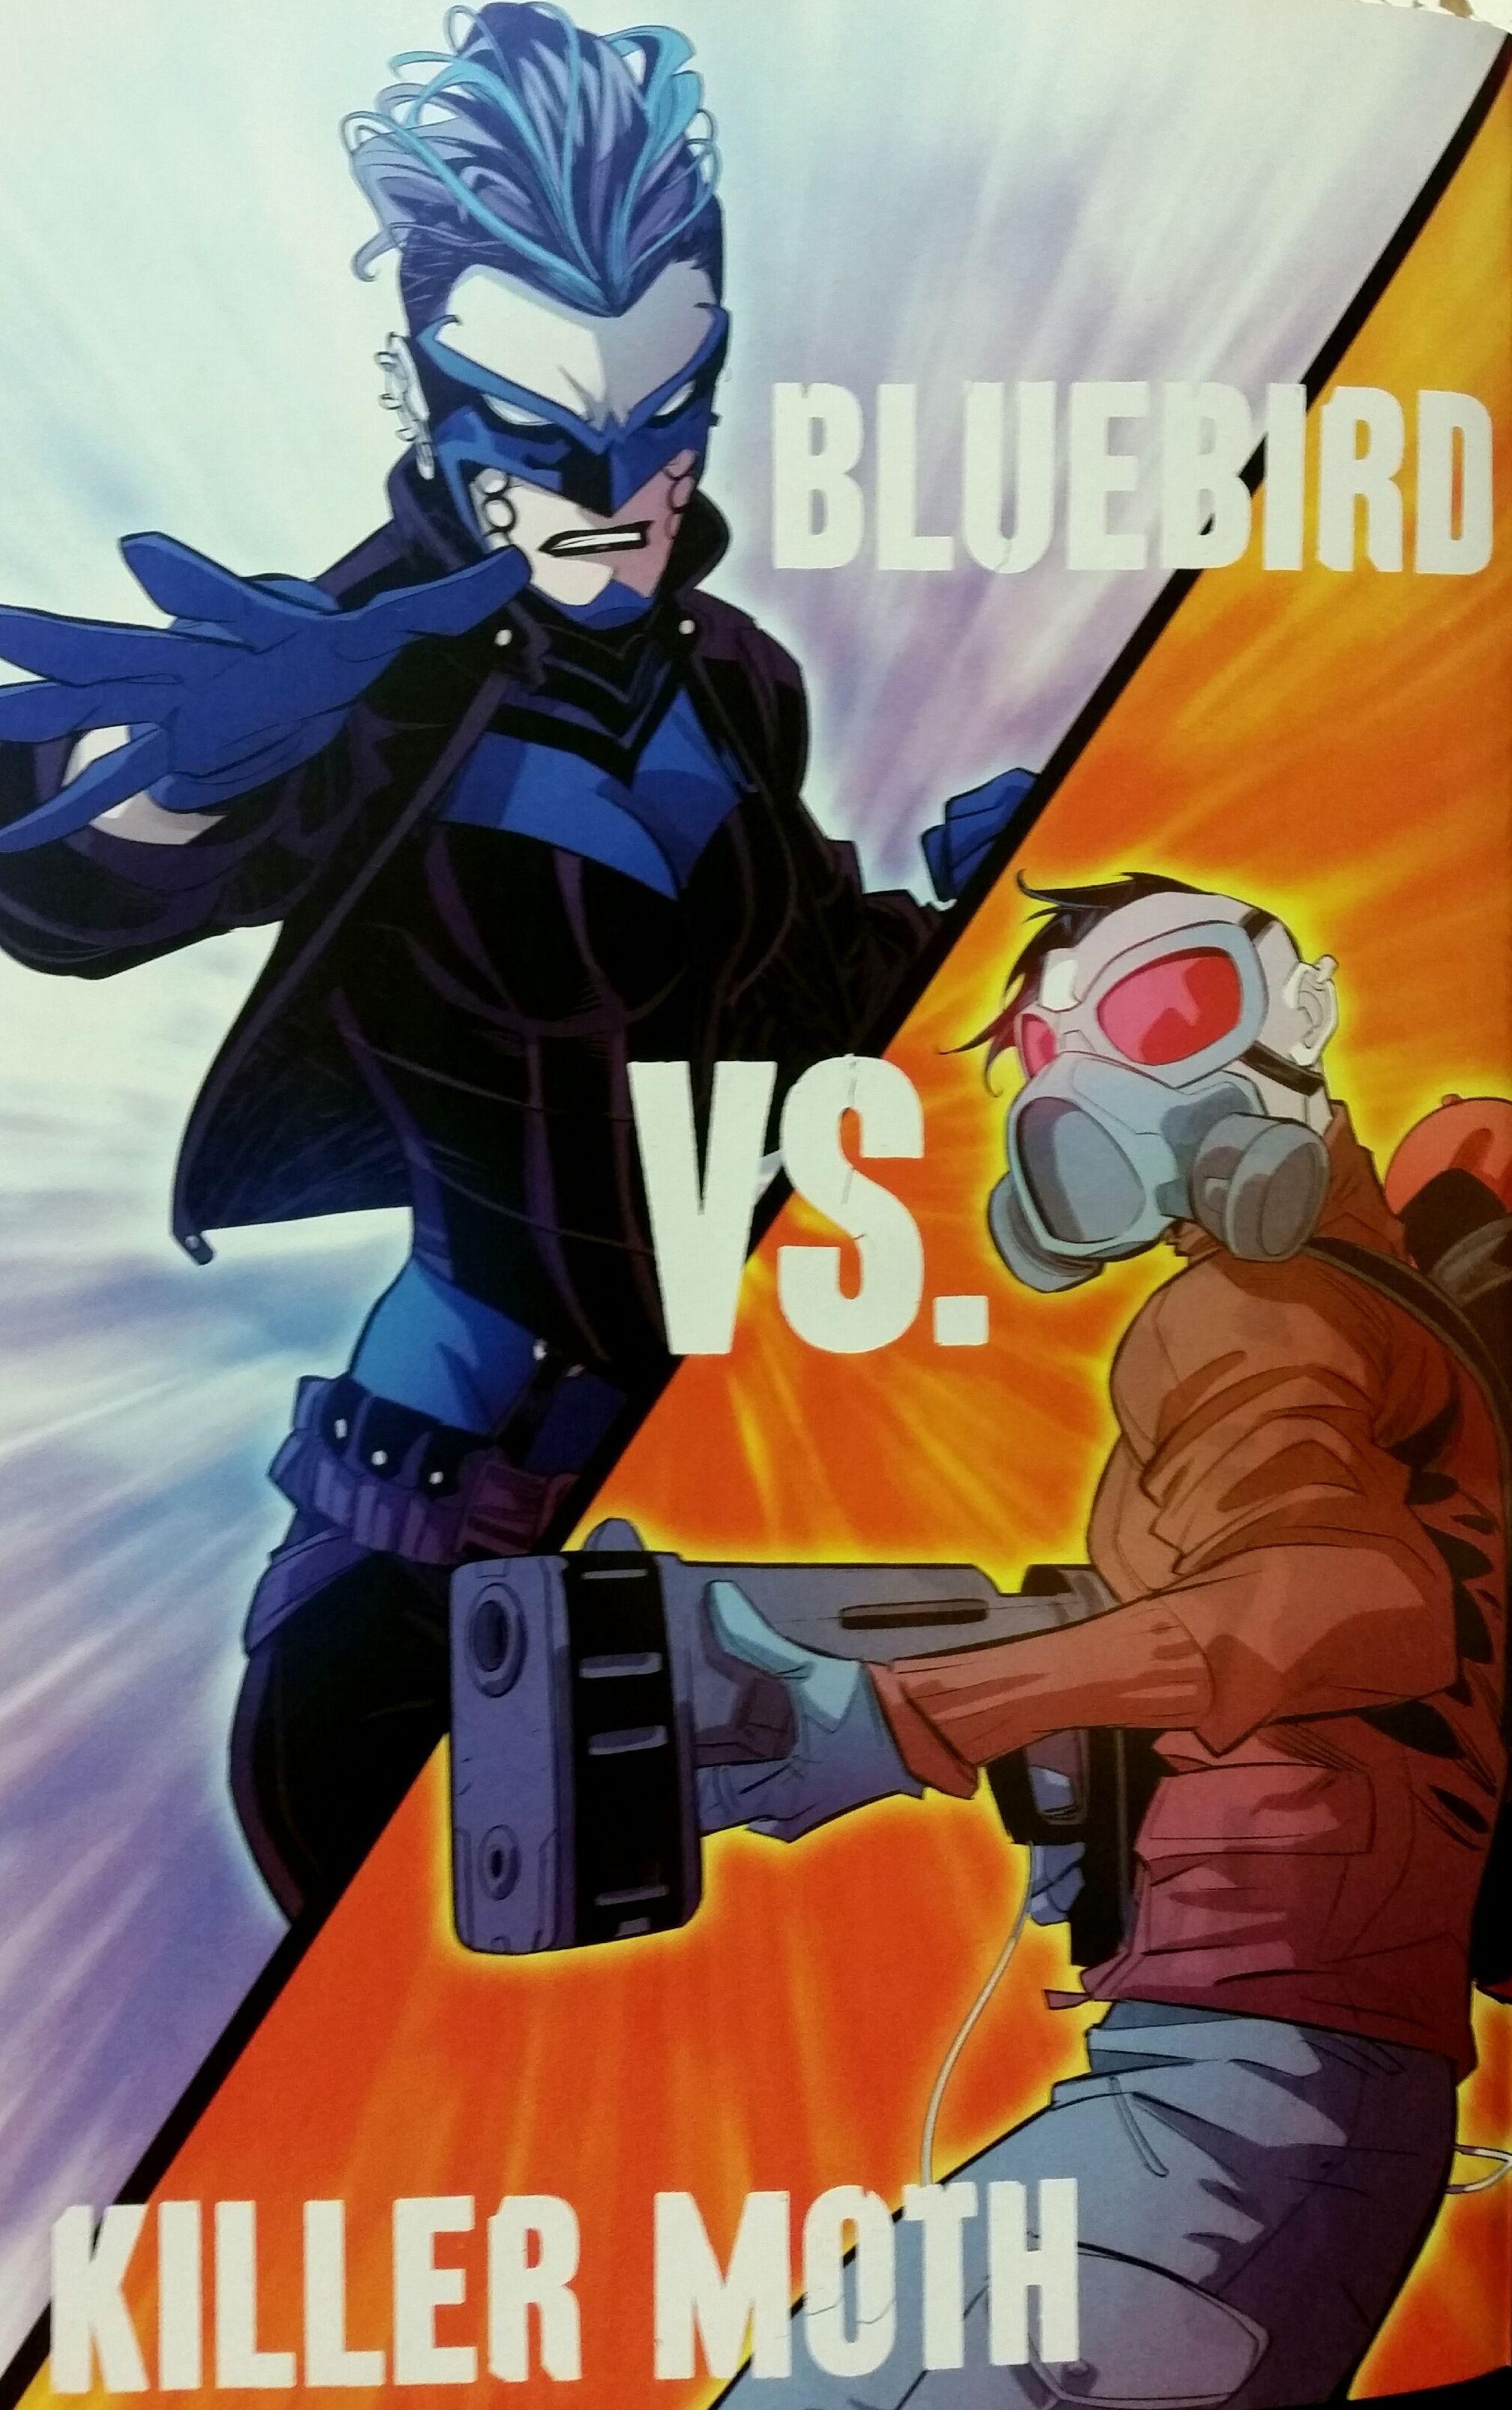 batgirl 50 Google Search Batgirl, Blue bird, Dc comics